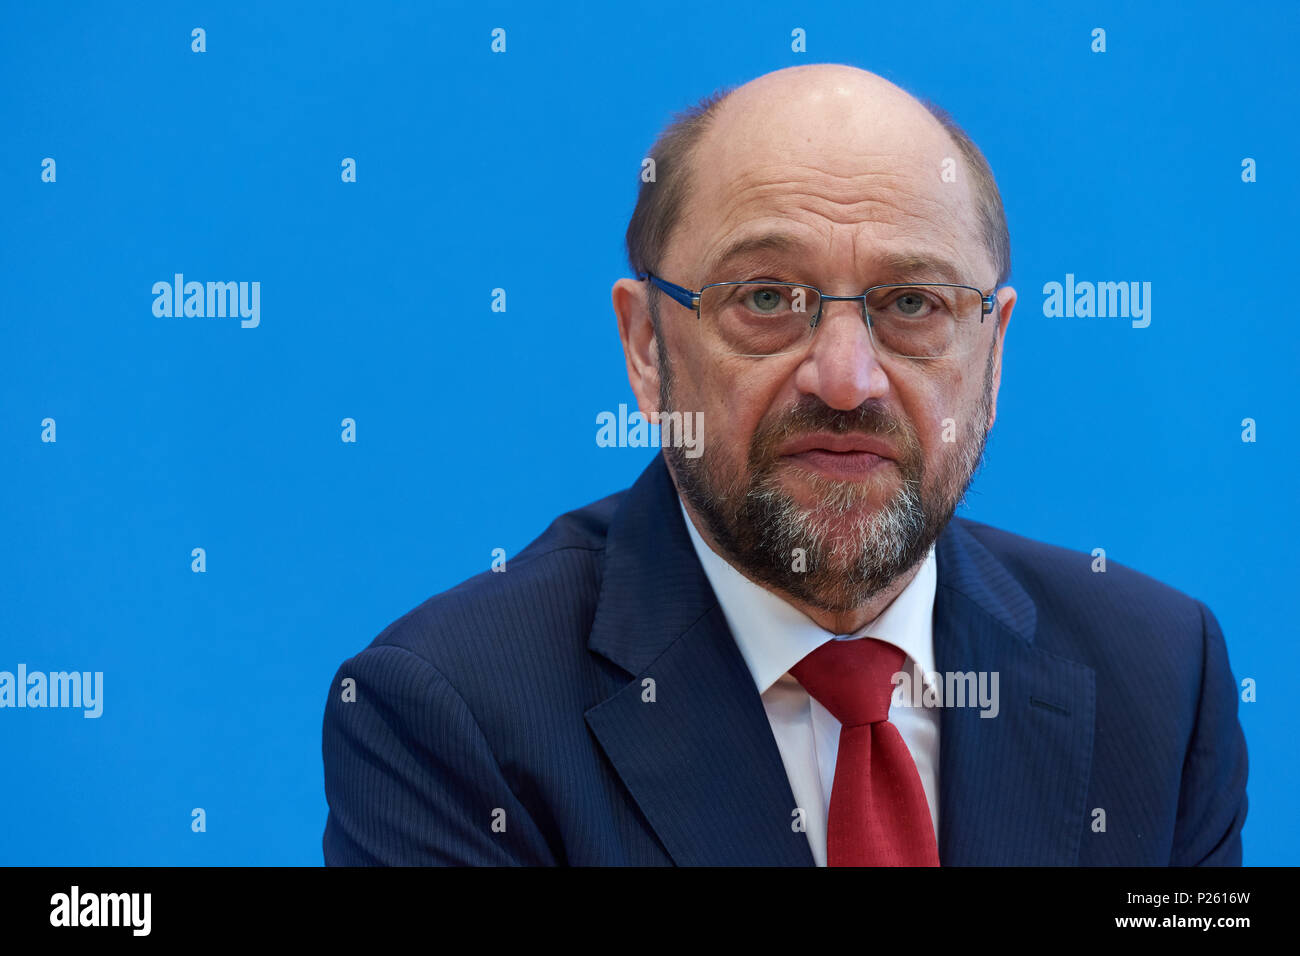 Berlin, Germany, Martin Schulz, SPD, President of the European Parliament - Stock Image